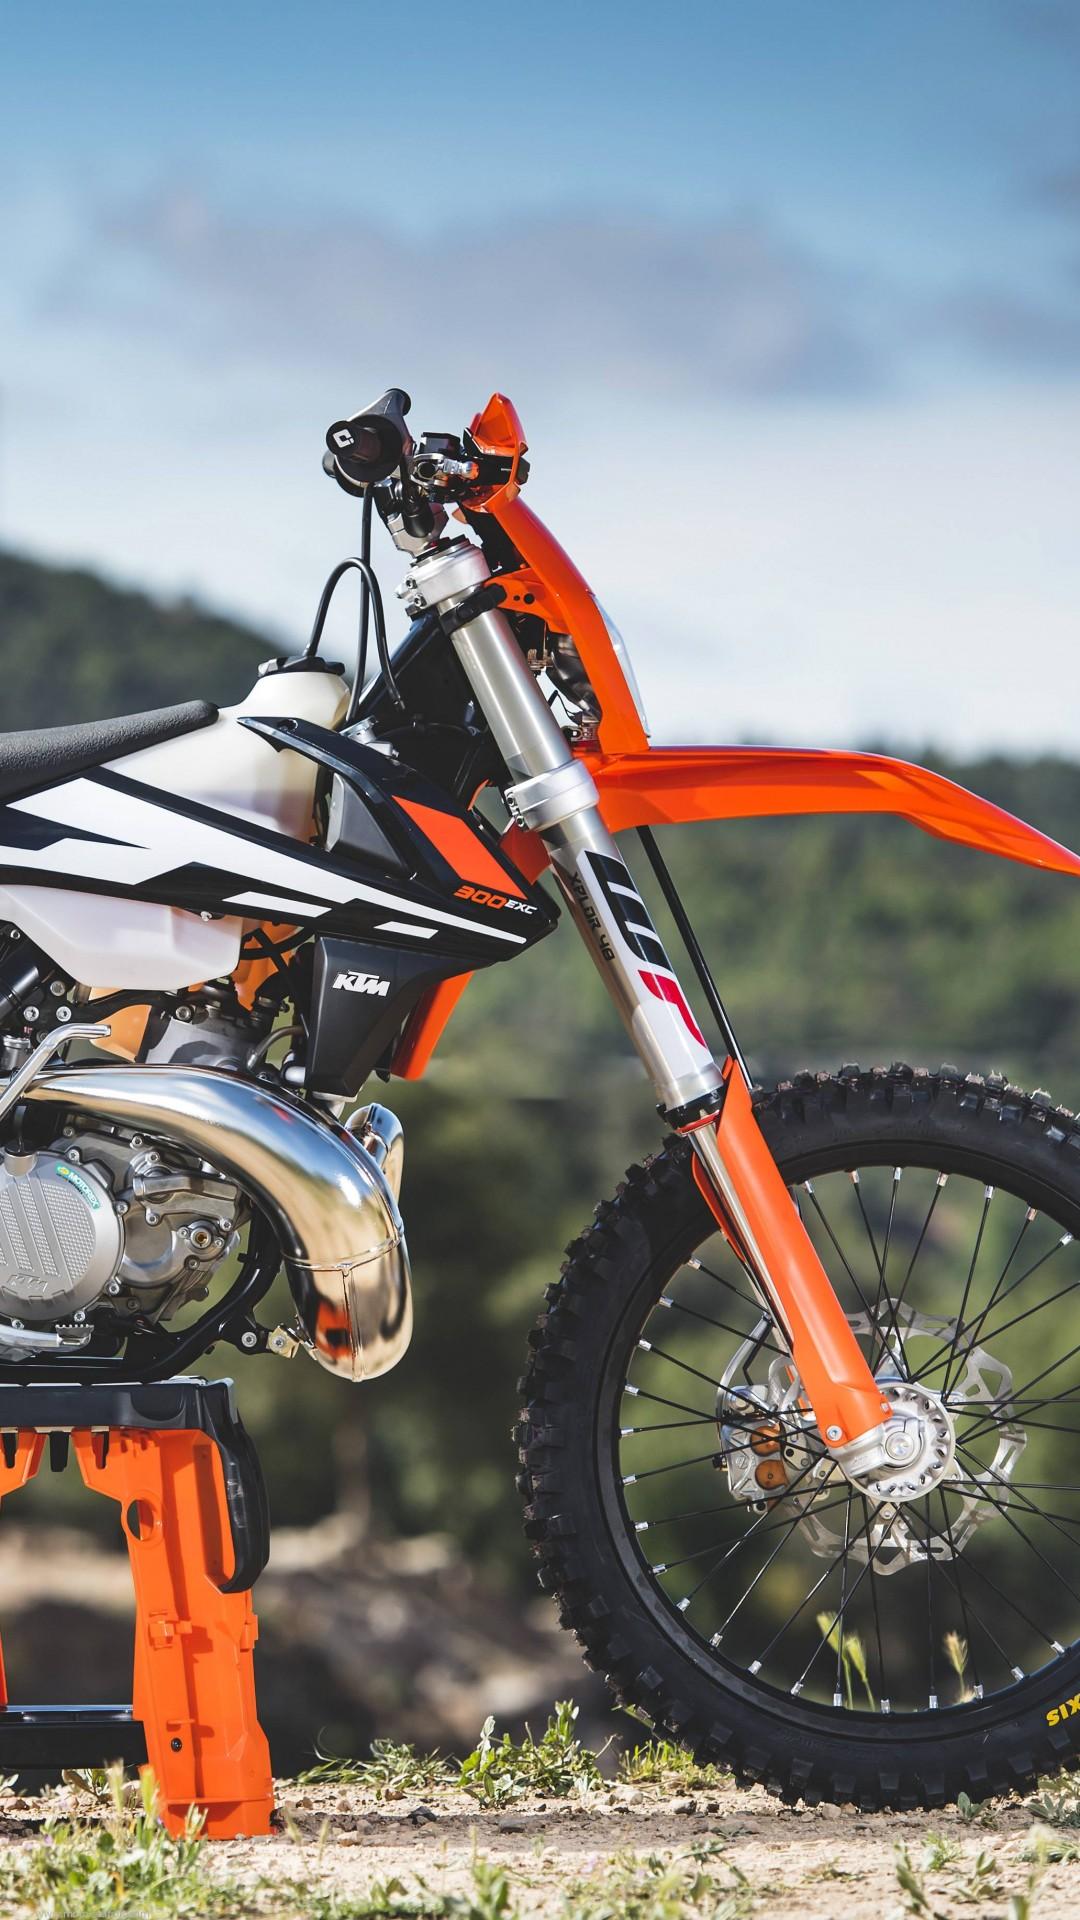 Wallpaper Ktm 300 Exc Turing Bike 2017 Cars Amp Bikes 14566